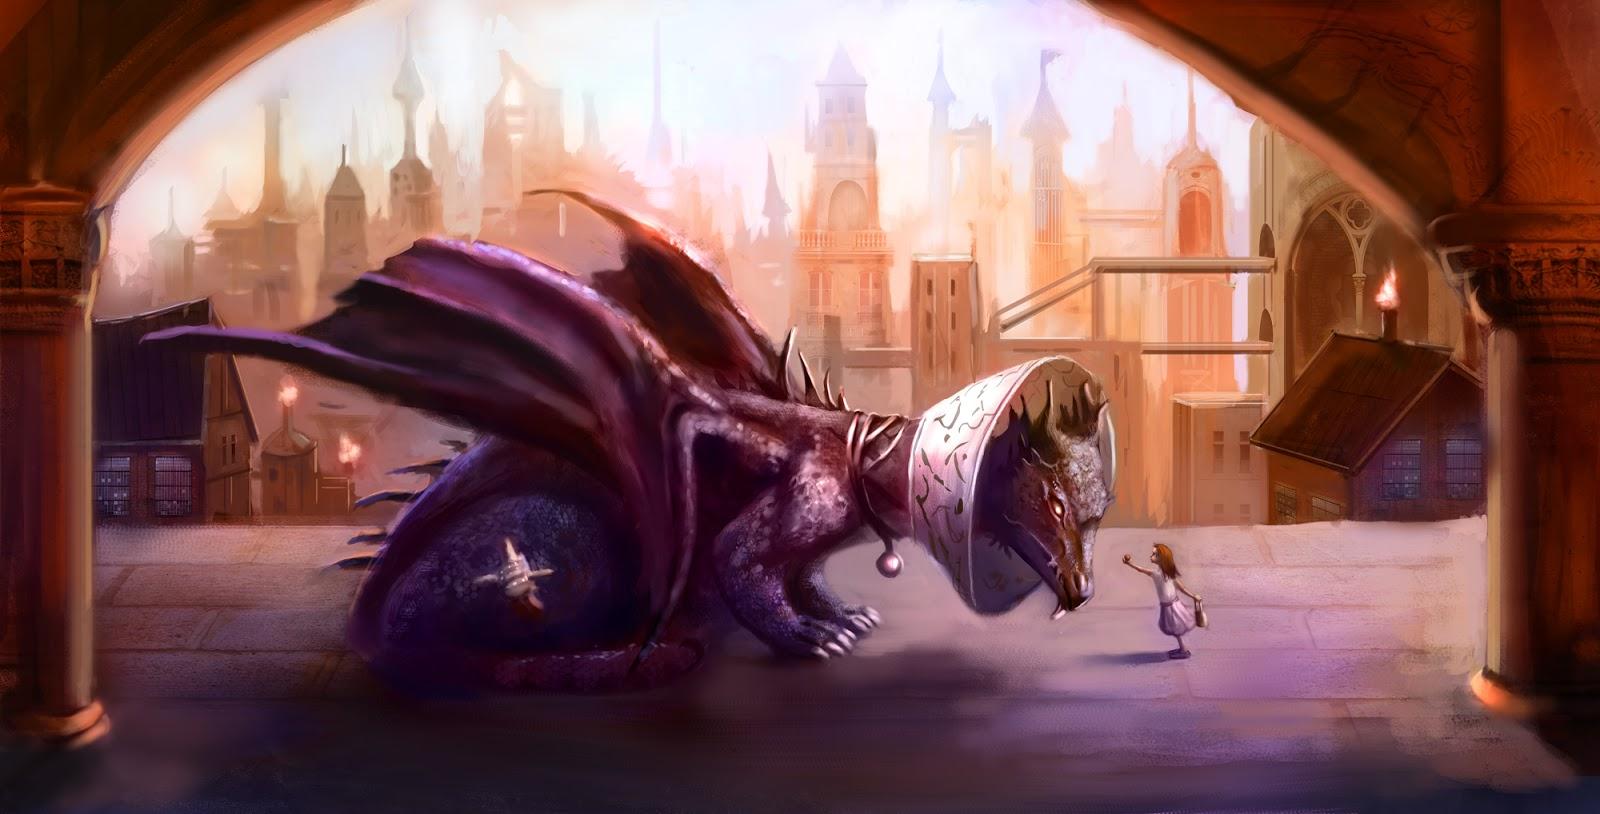 Girl using dragon dildo